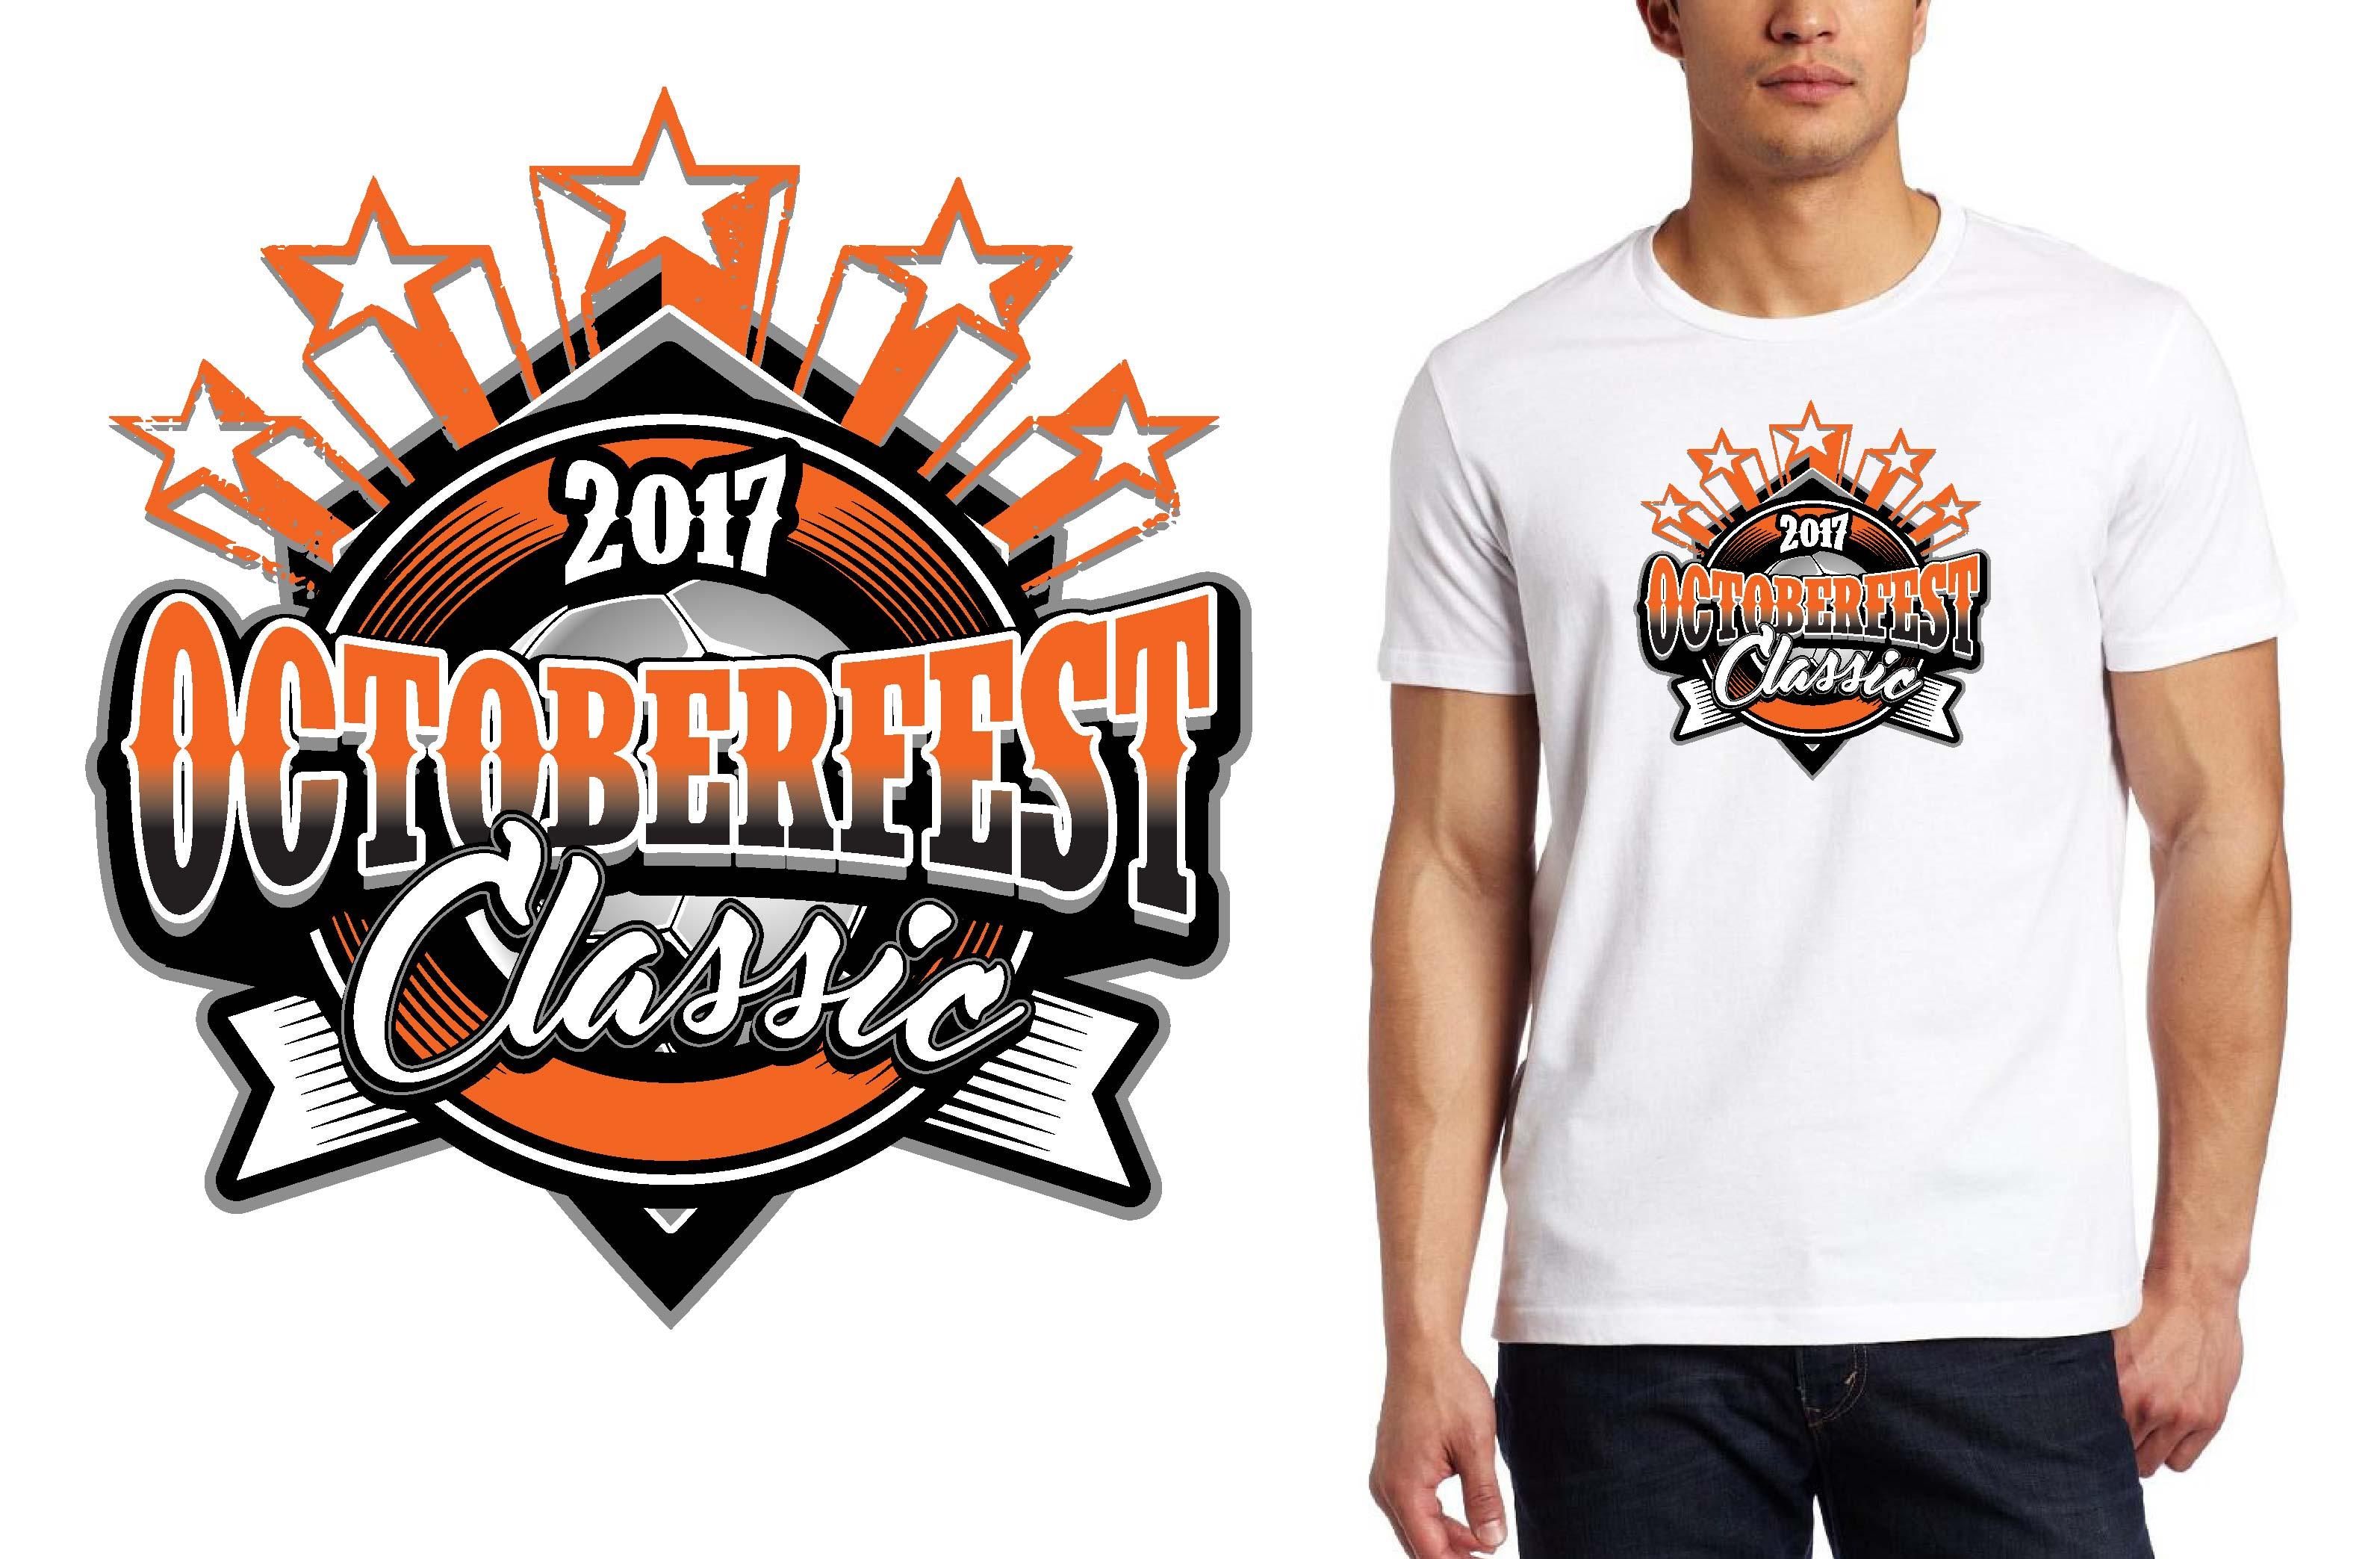 10.13.17 Octoberfest Classic lori soccer